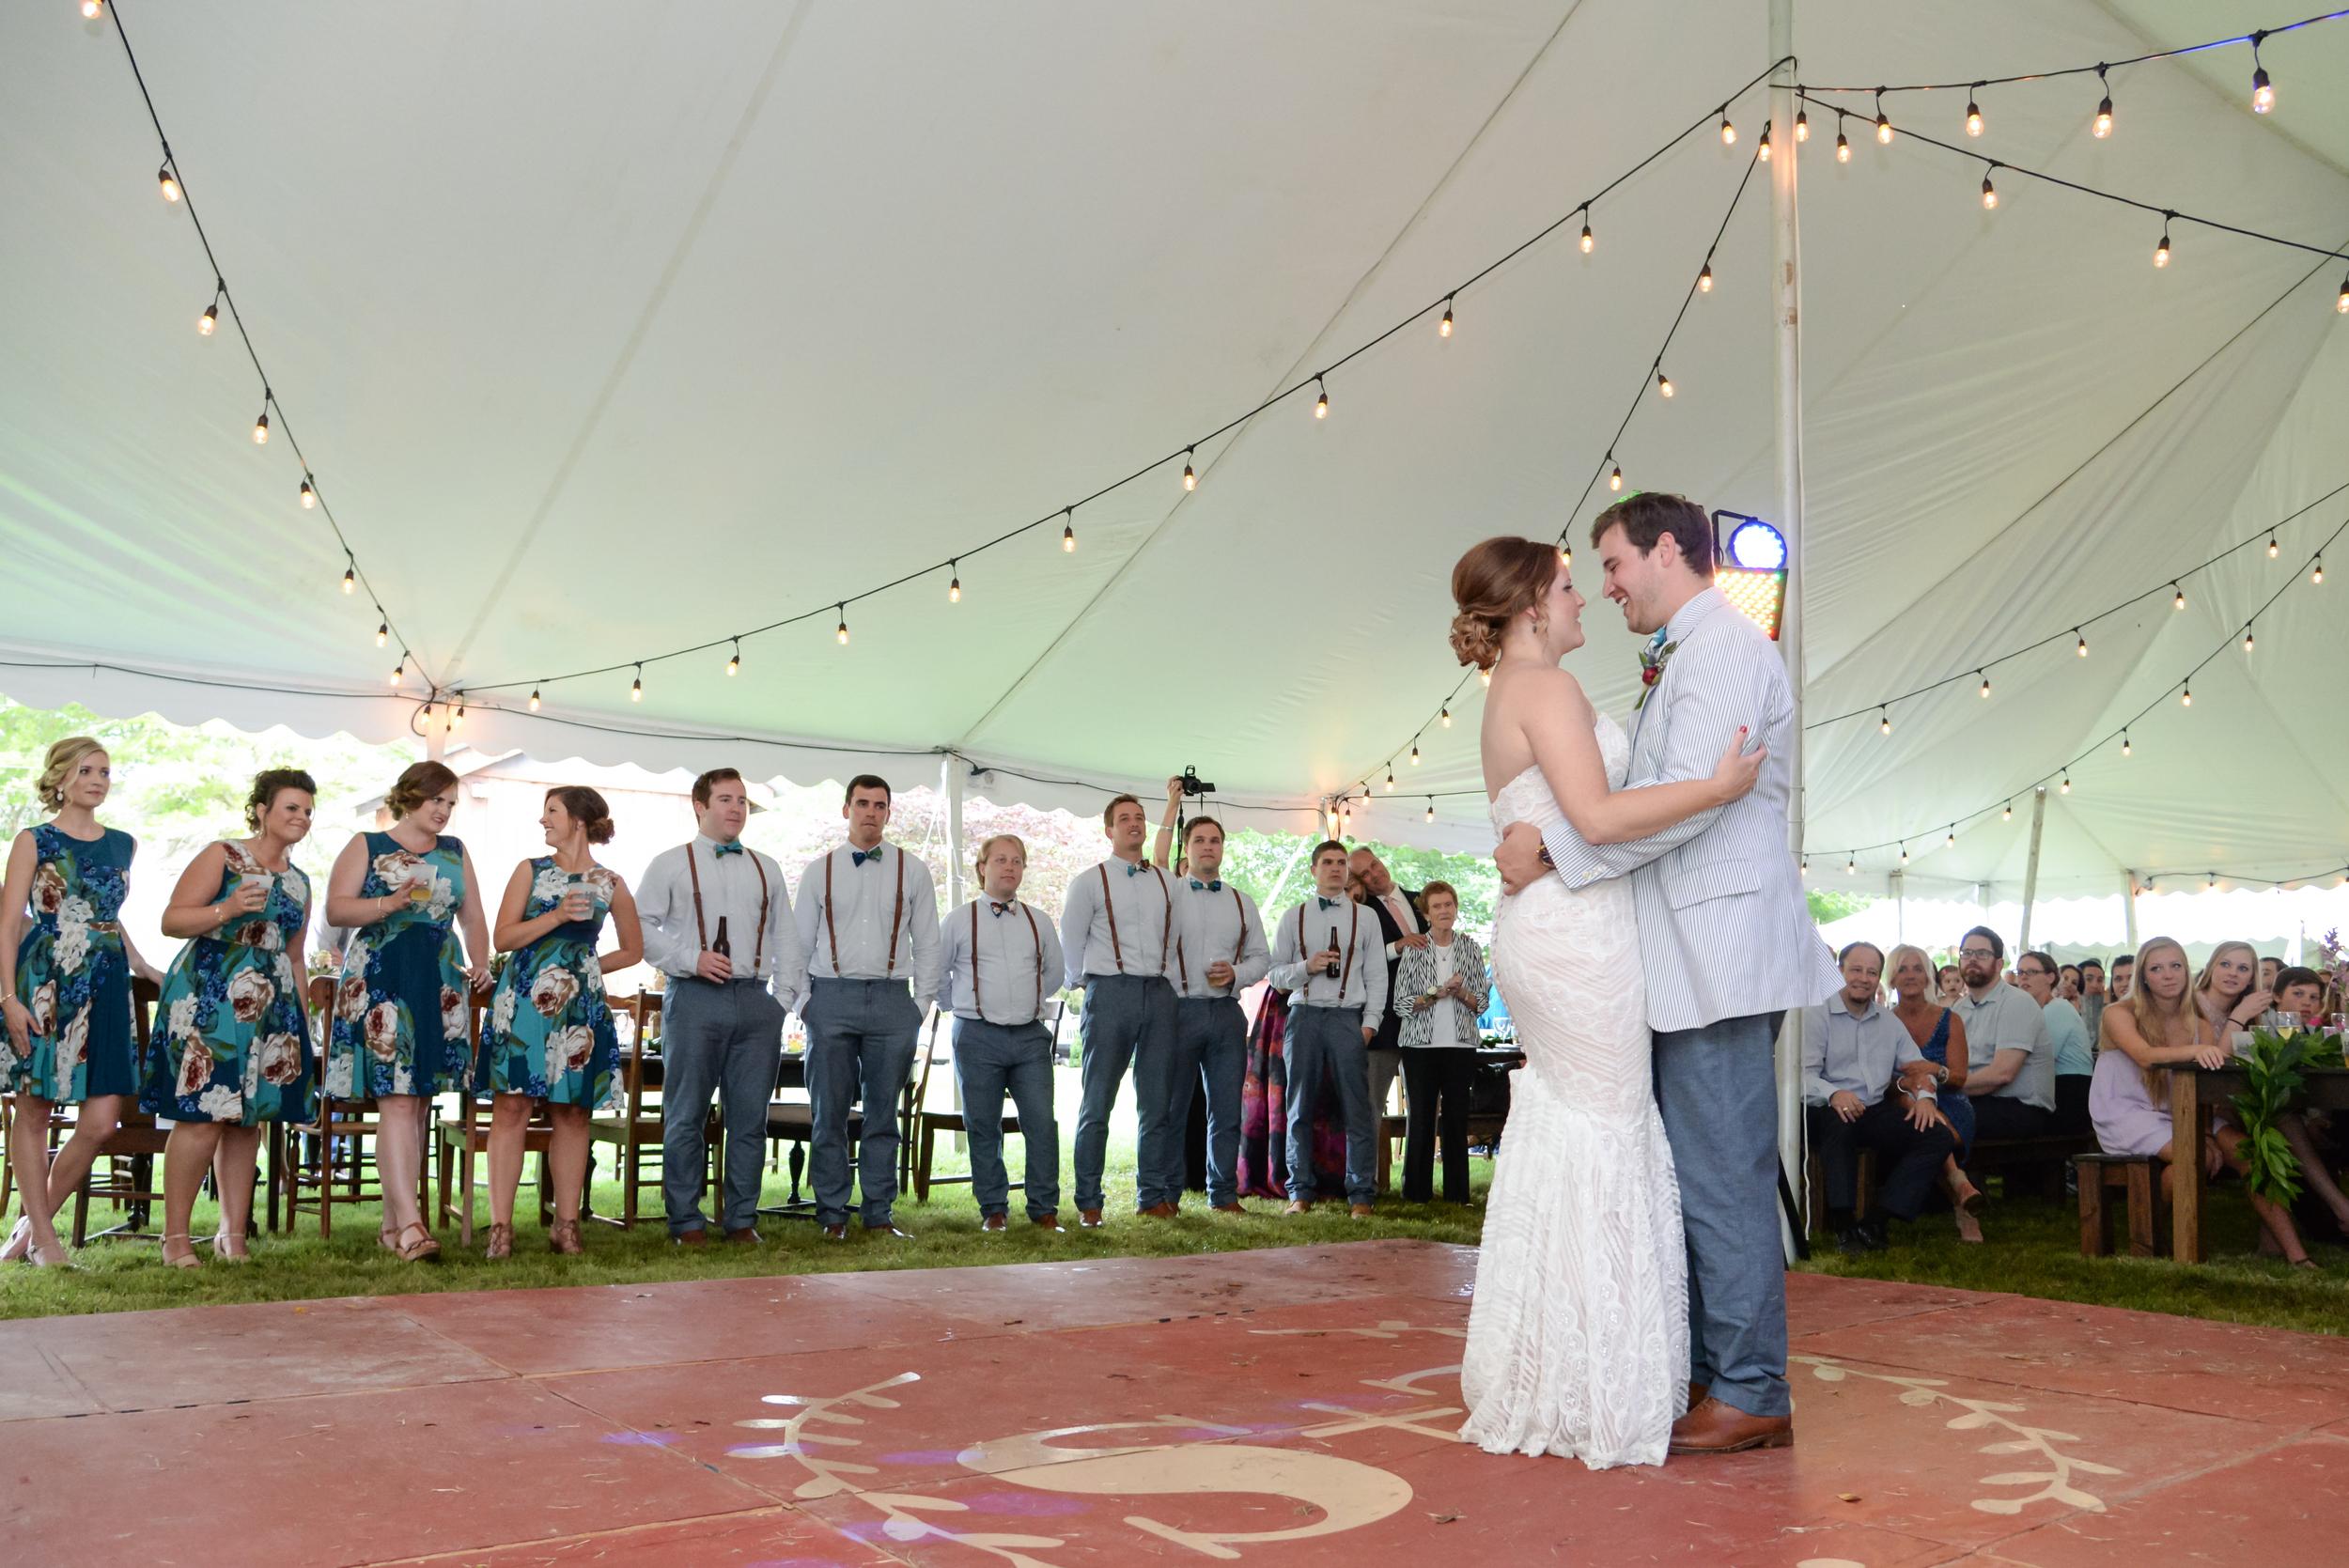 st louis wedding newlywed first dance